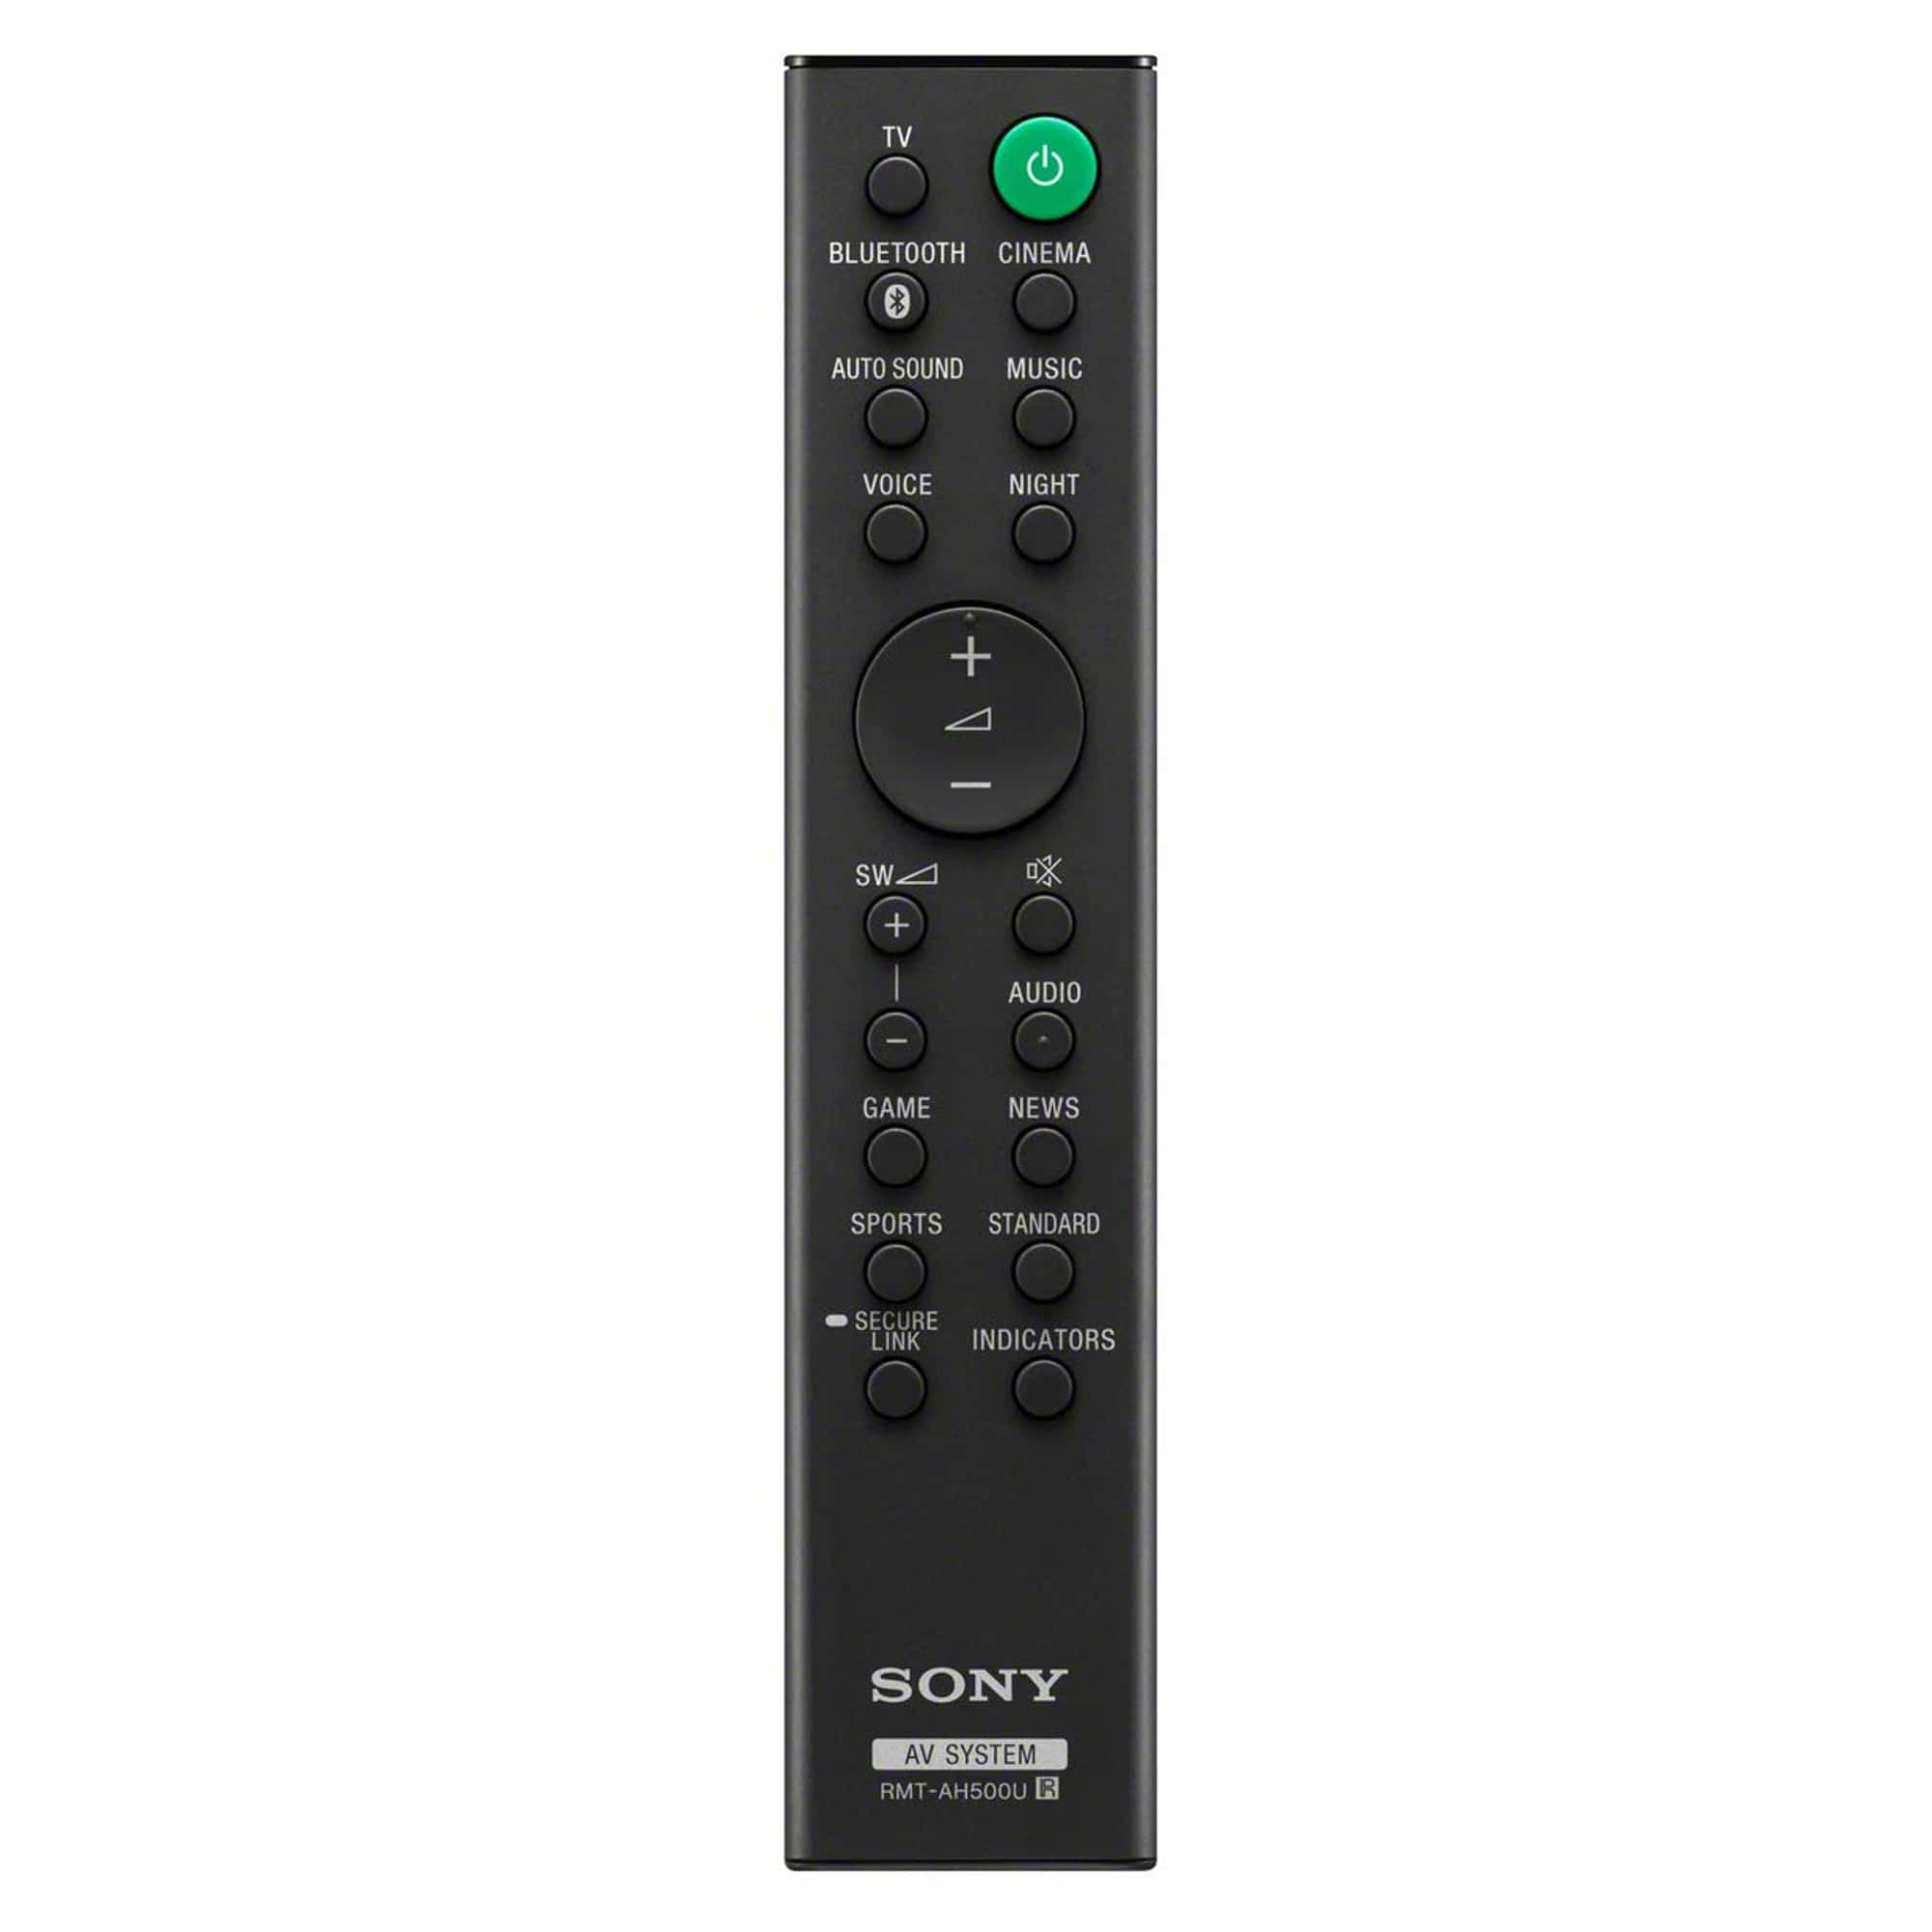 Sony HTSD35 Bluetooth Soundbar with Wireless Subwoofer